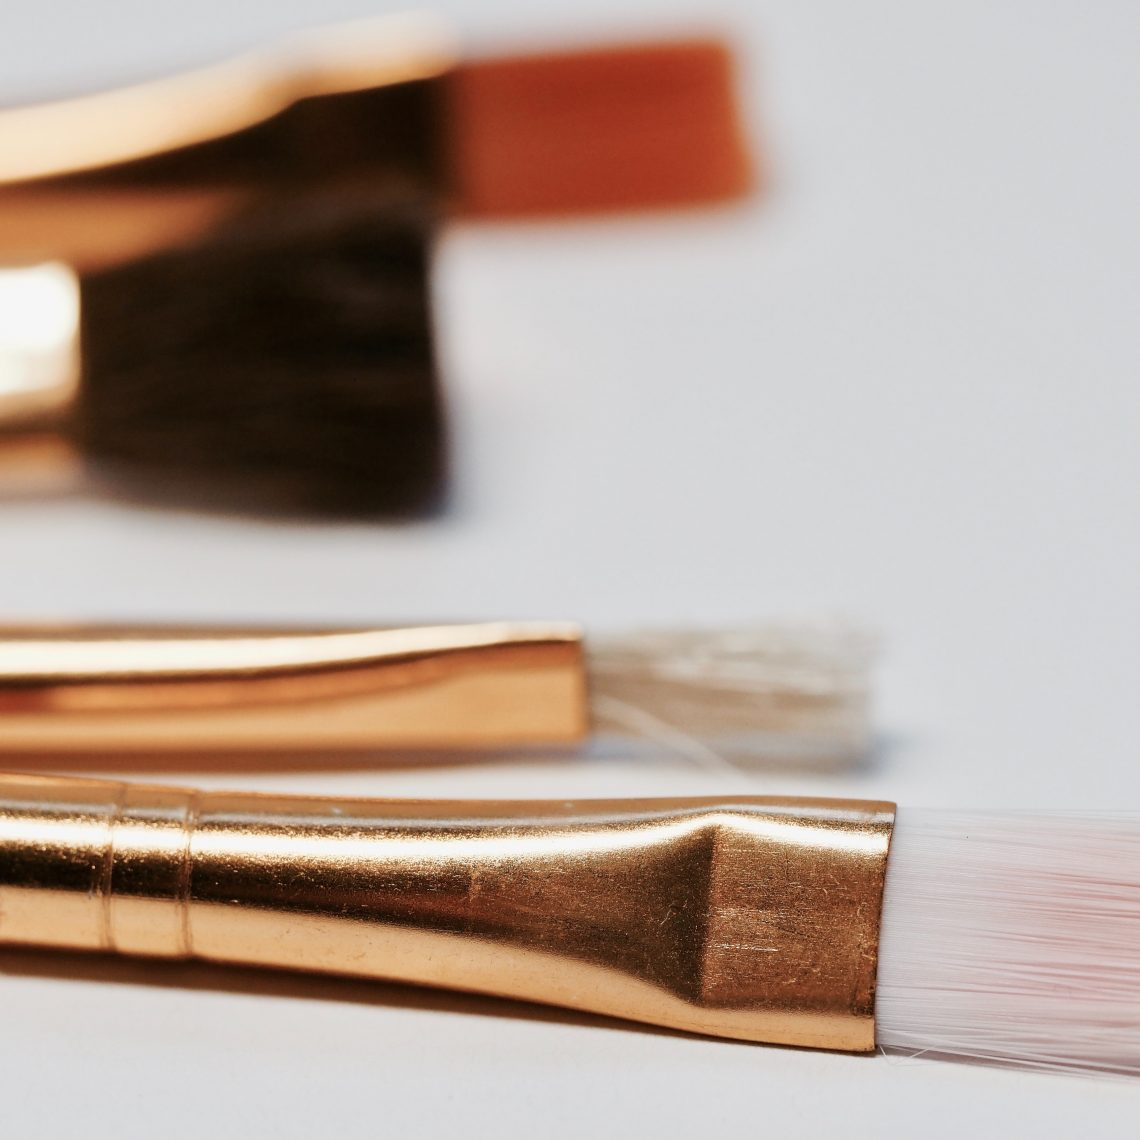 titanium dioxide   nanoparticle danger   cosmetic additive   Egyptian Organics